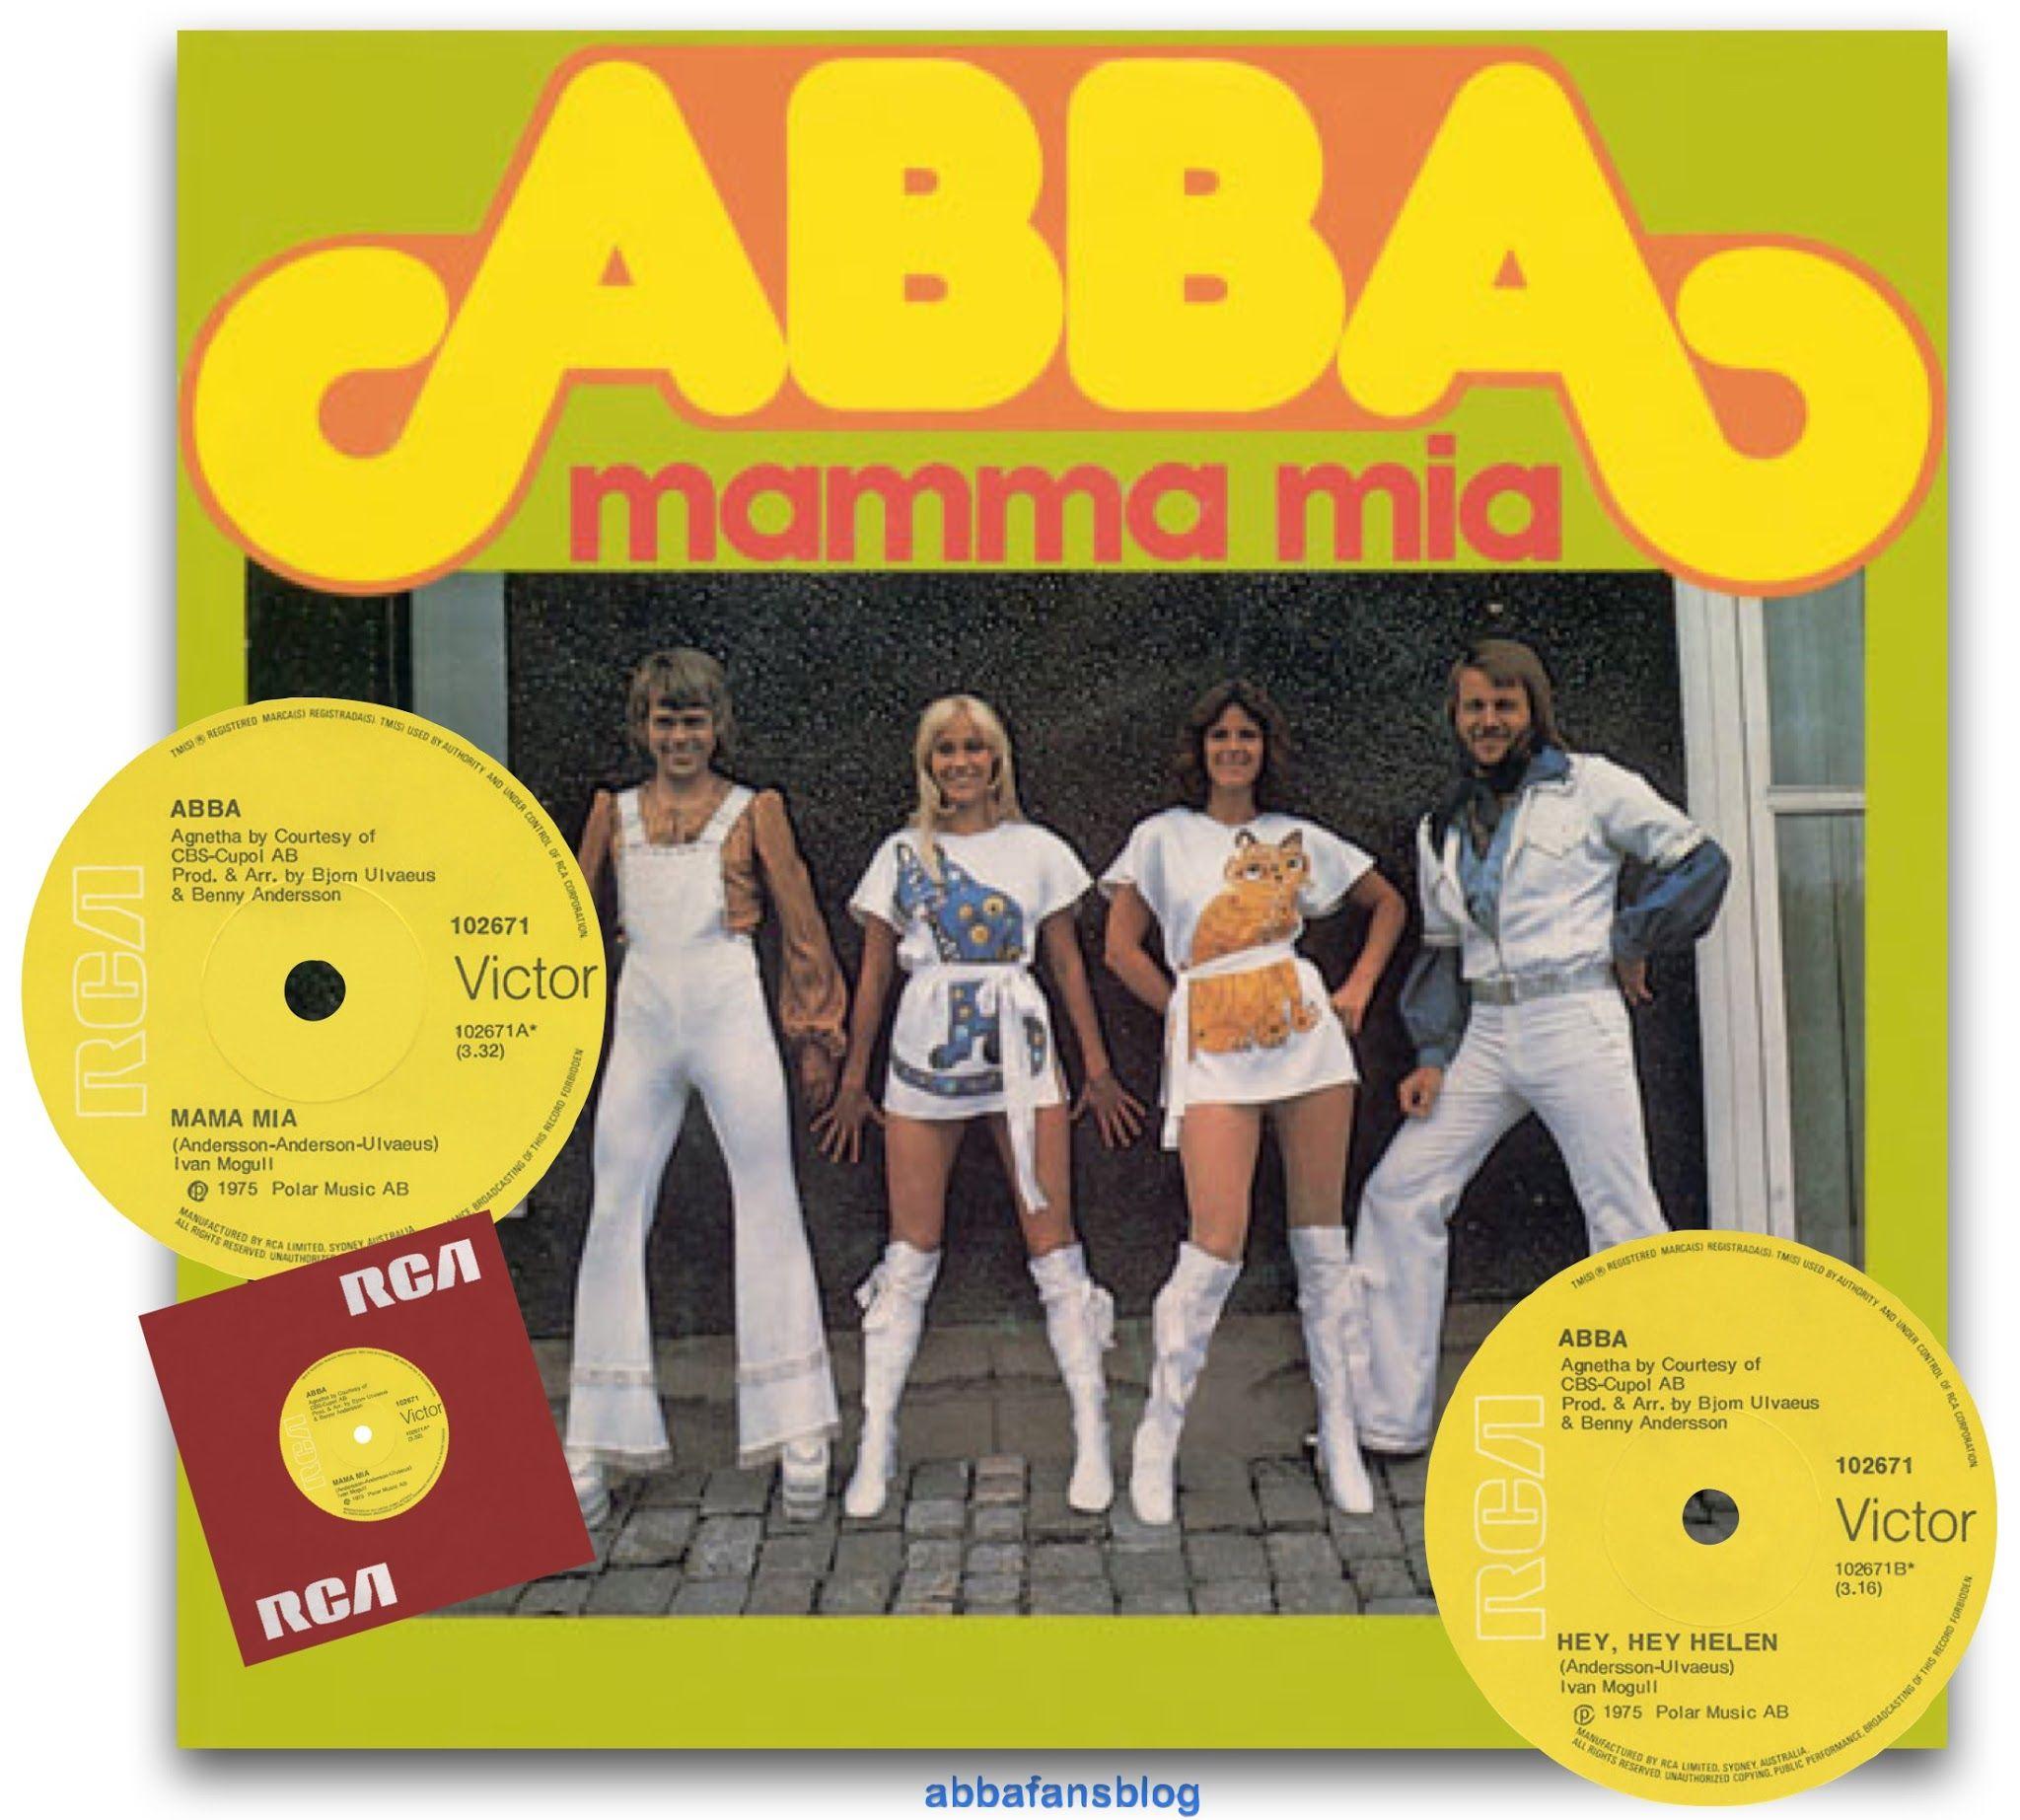 22nd September 1975 Album Covers Mamma Mia 80s Album Covers